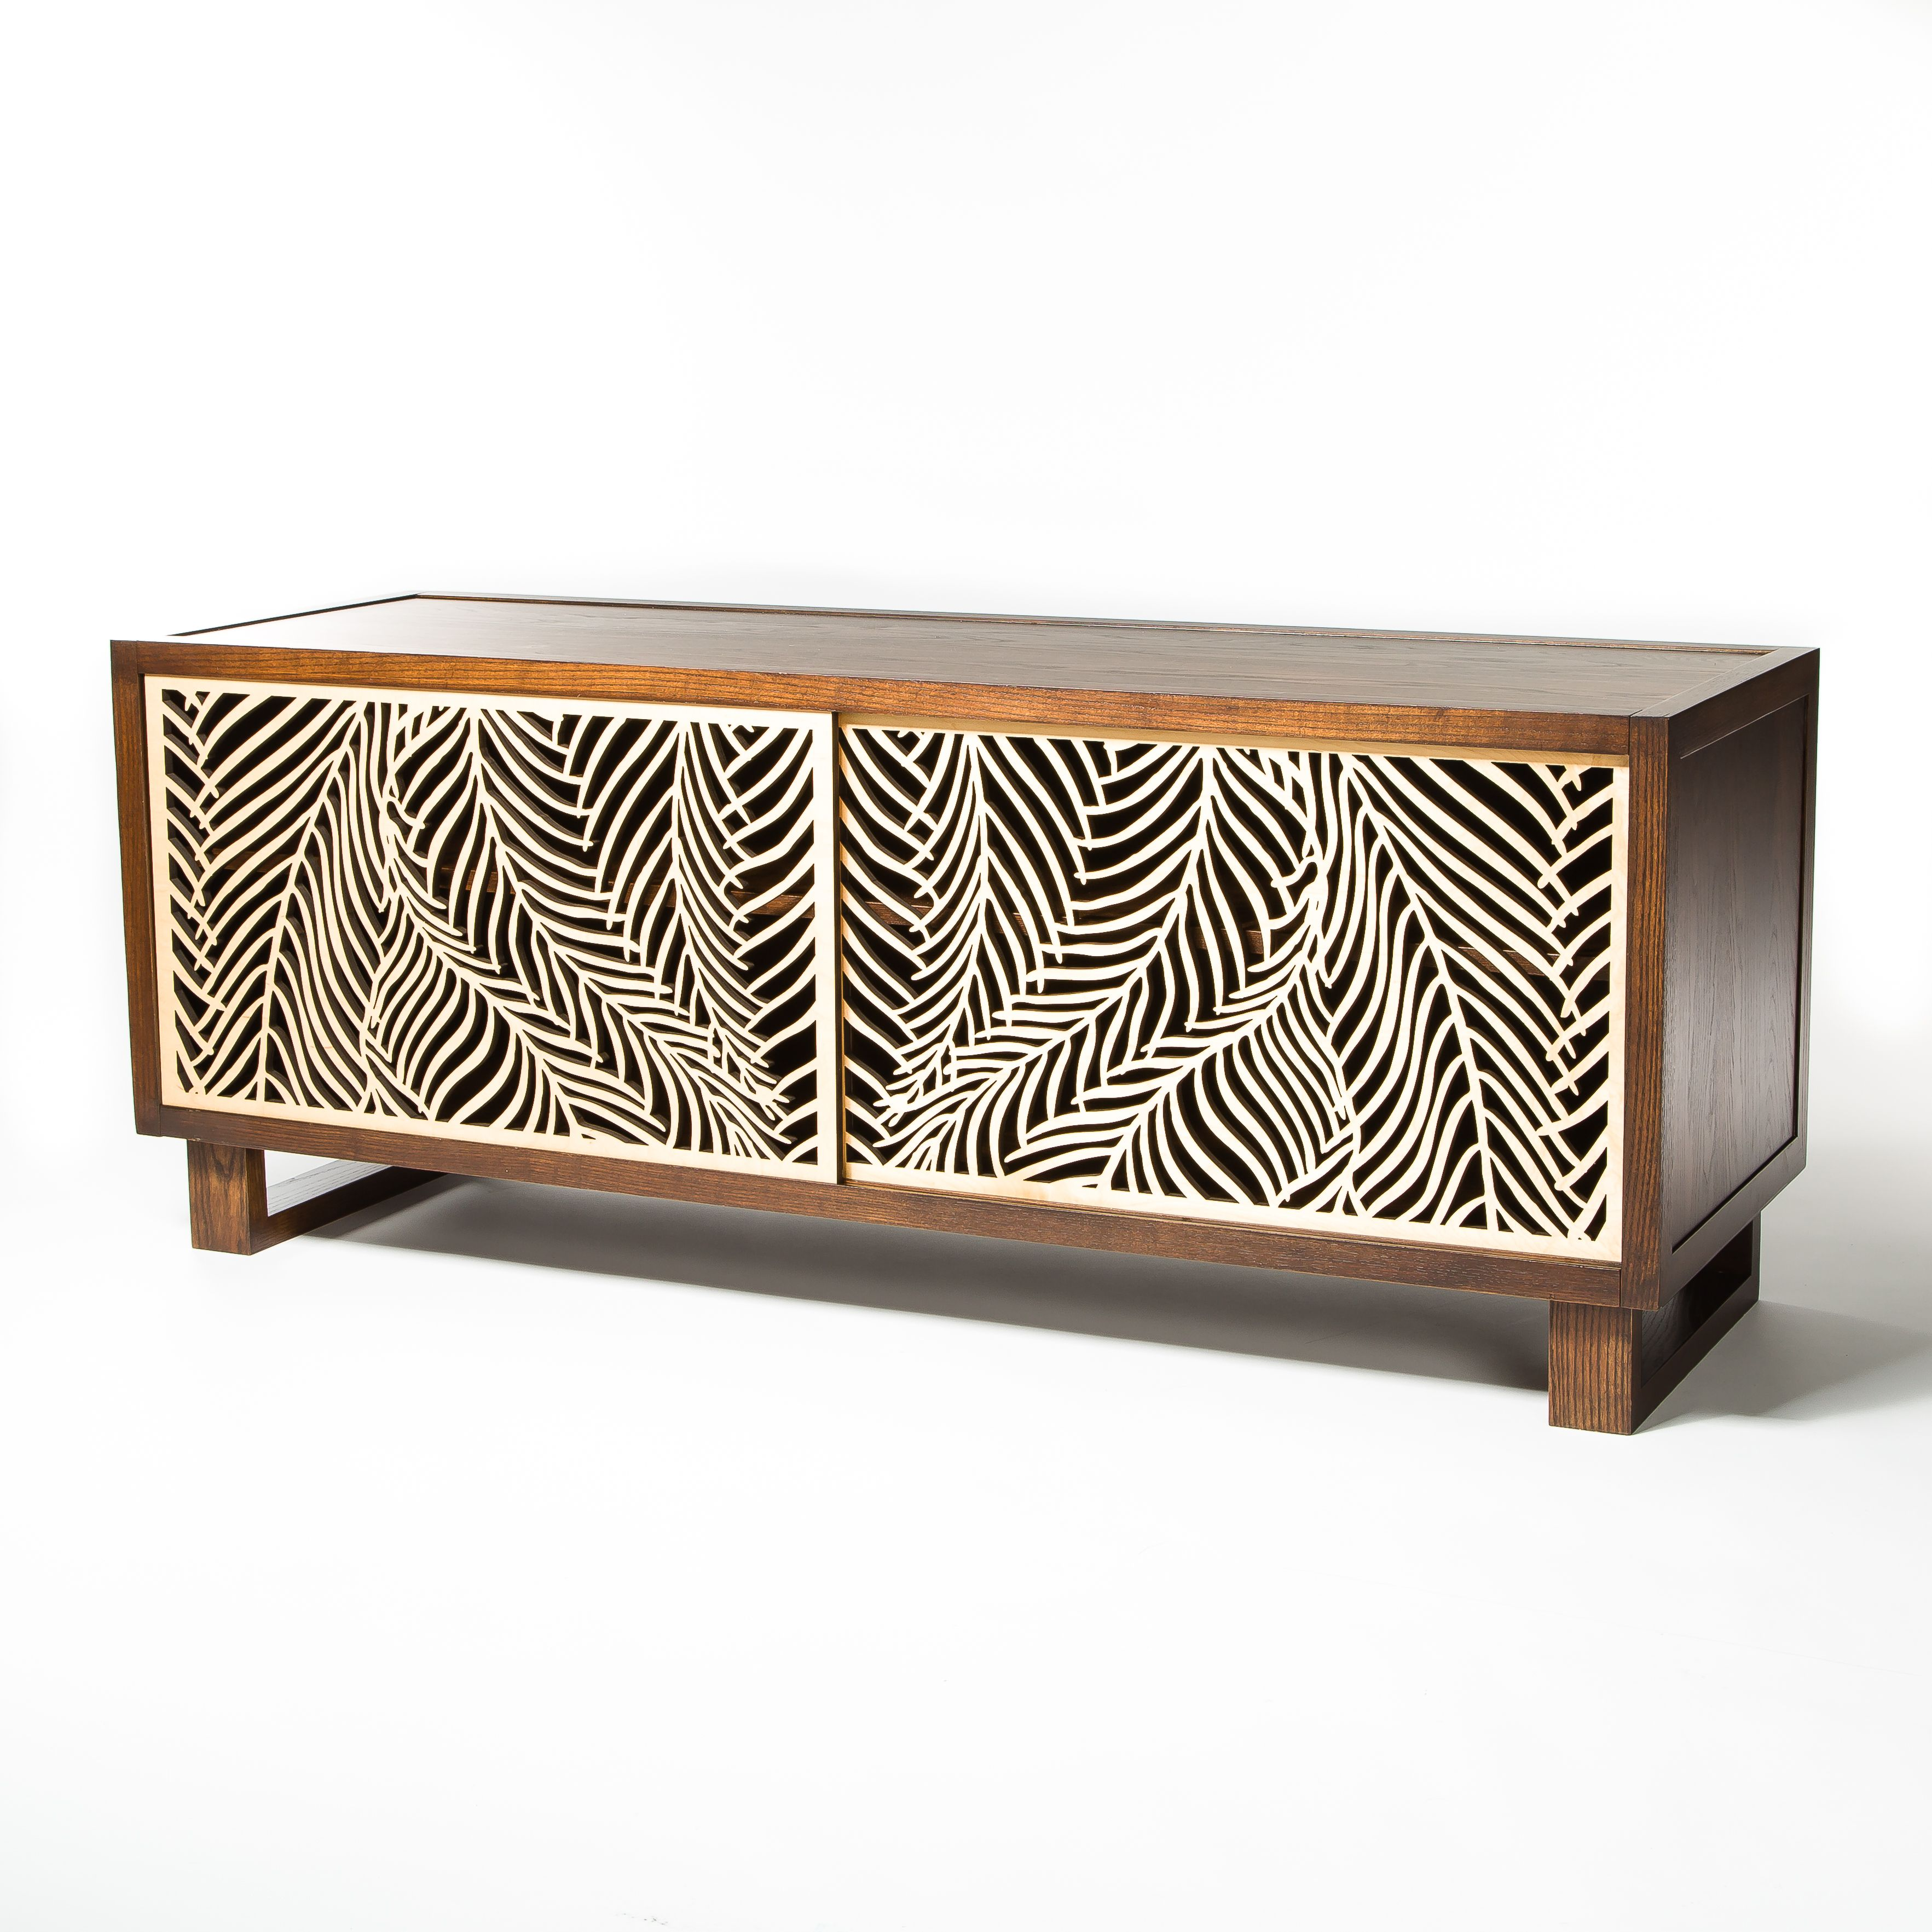 Beautiful credenza featuring intricate wispy palm laser cut door